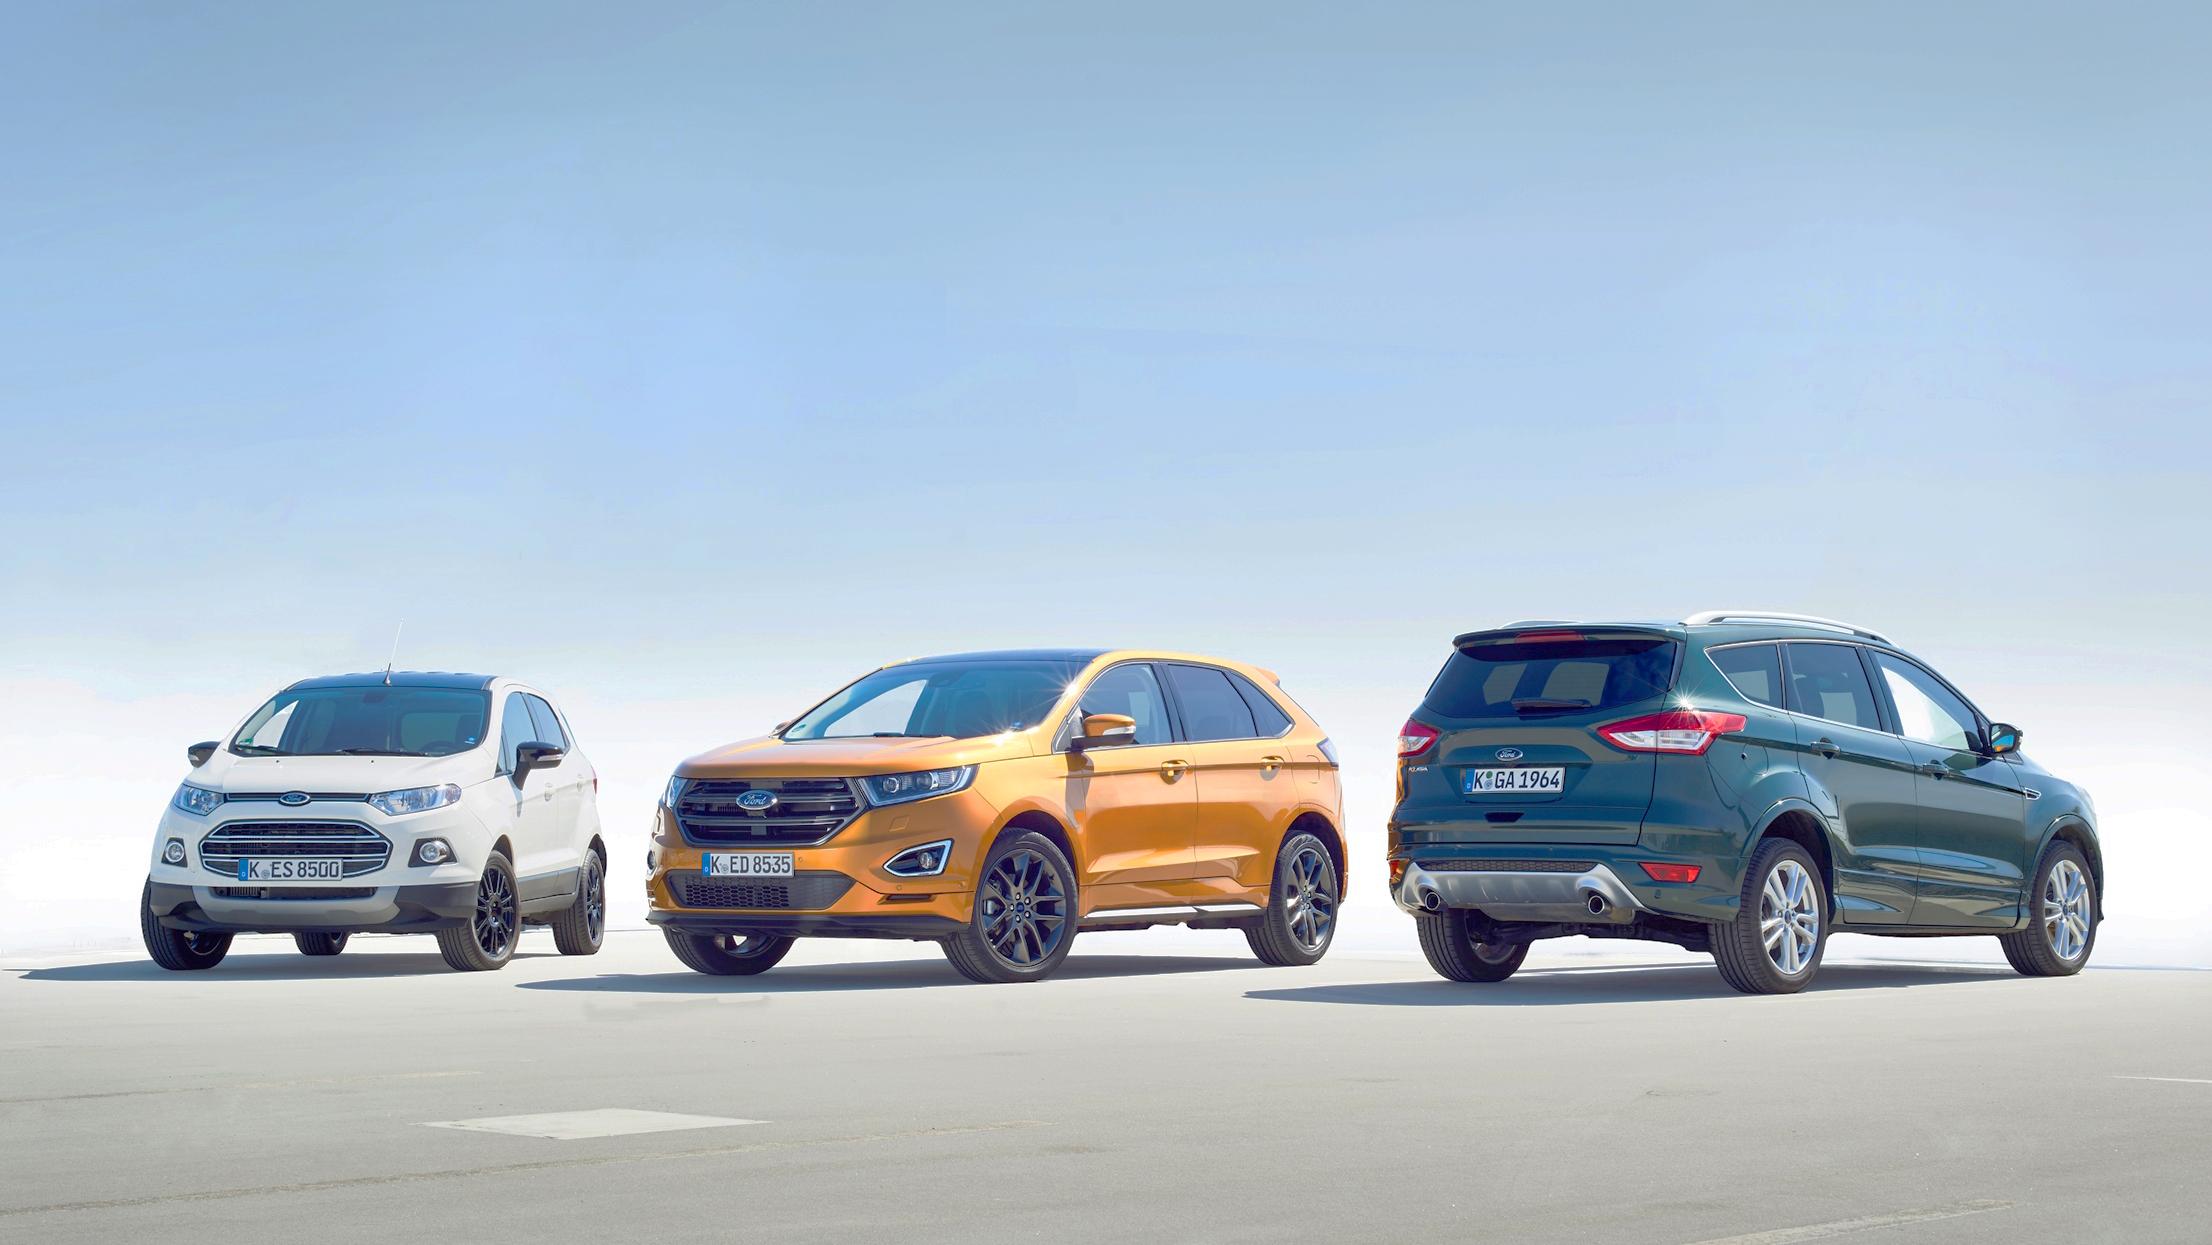 image automotive america rise it suv skv ford the mintel com dont suvs a explorer call market comeback of news in blog